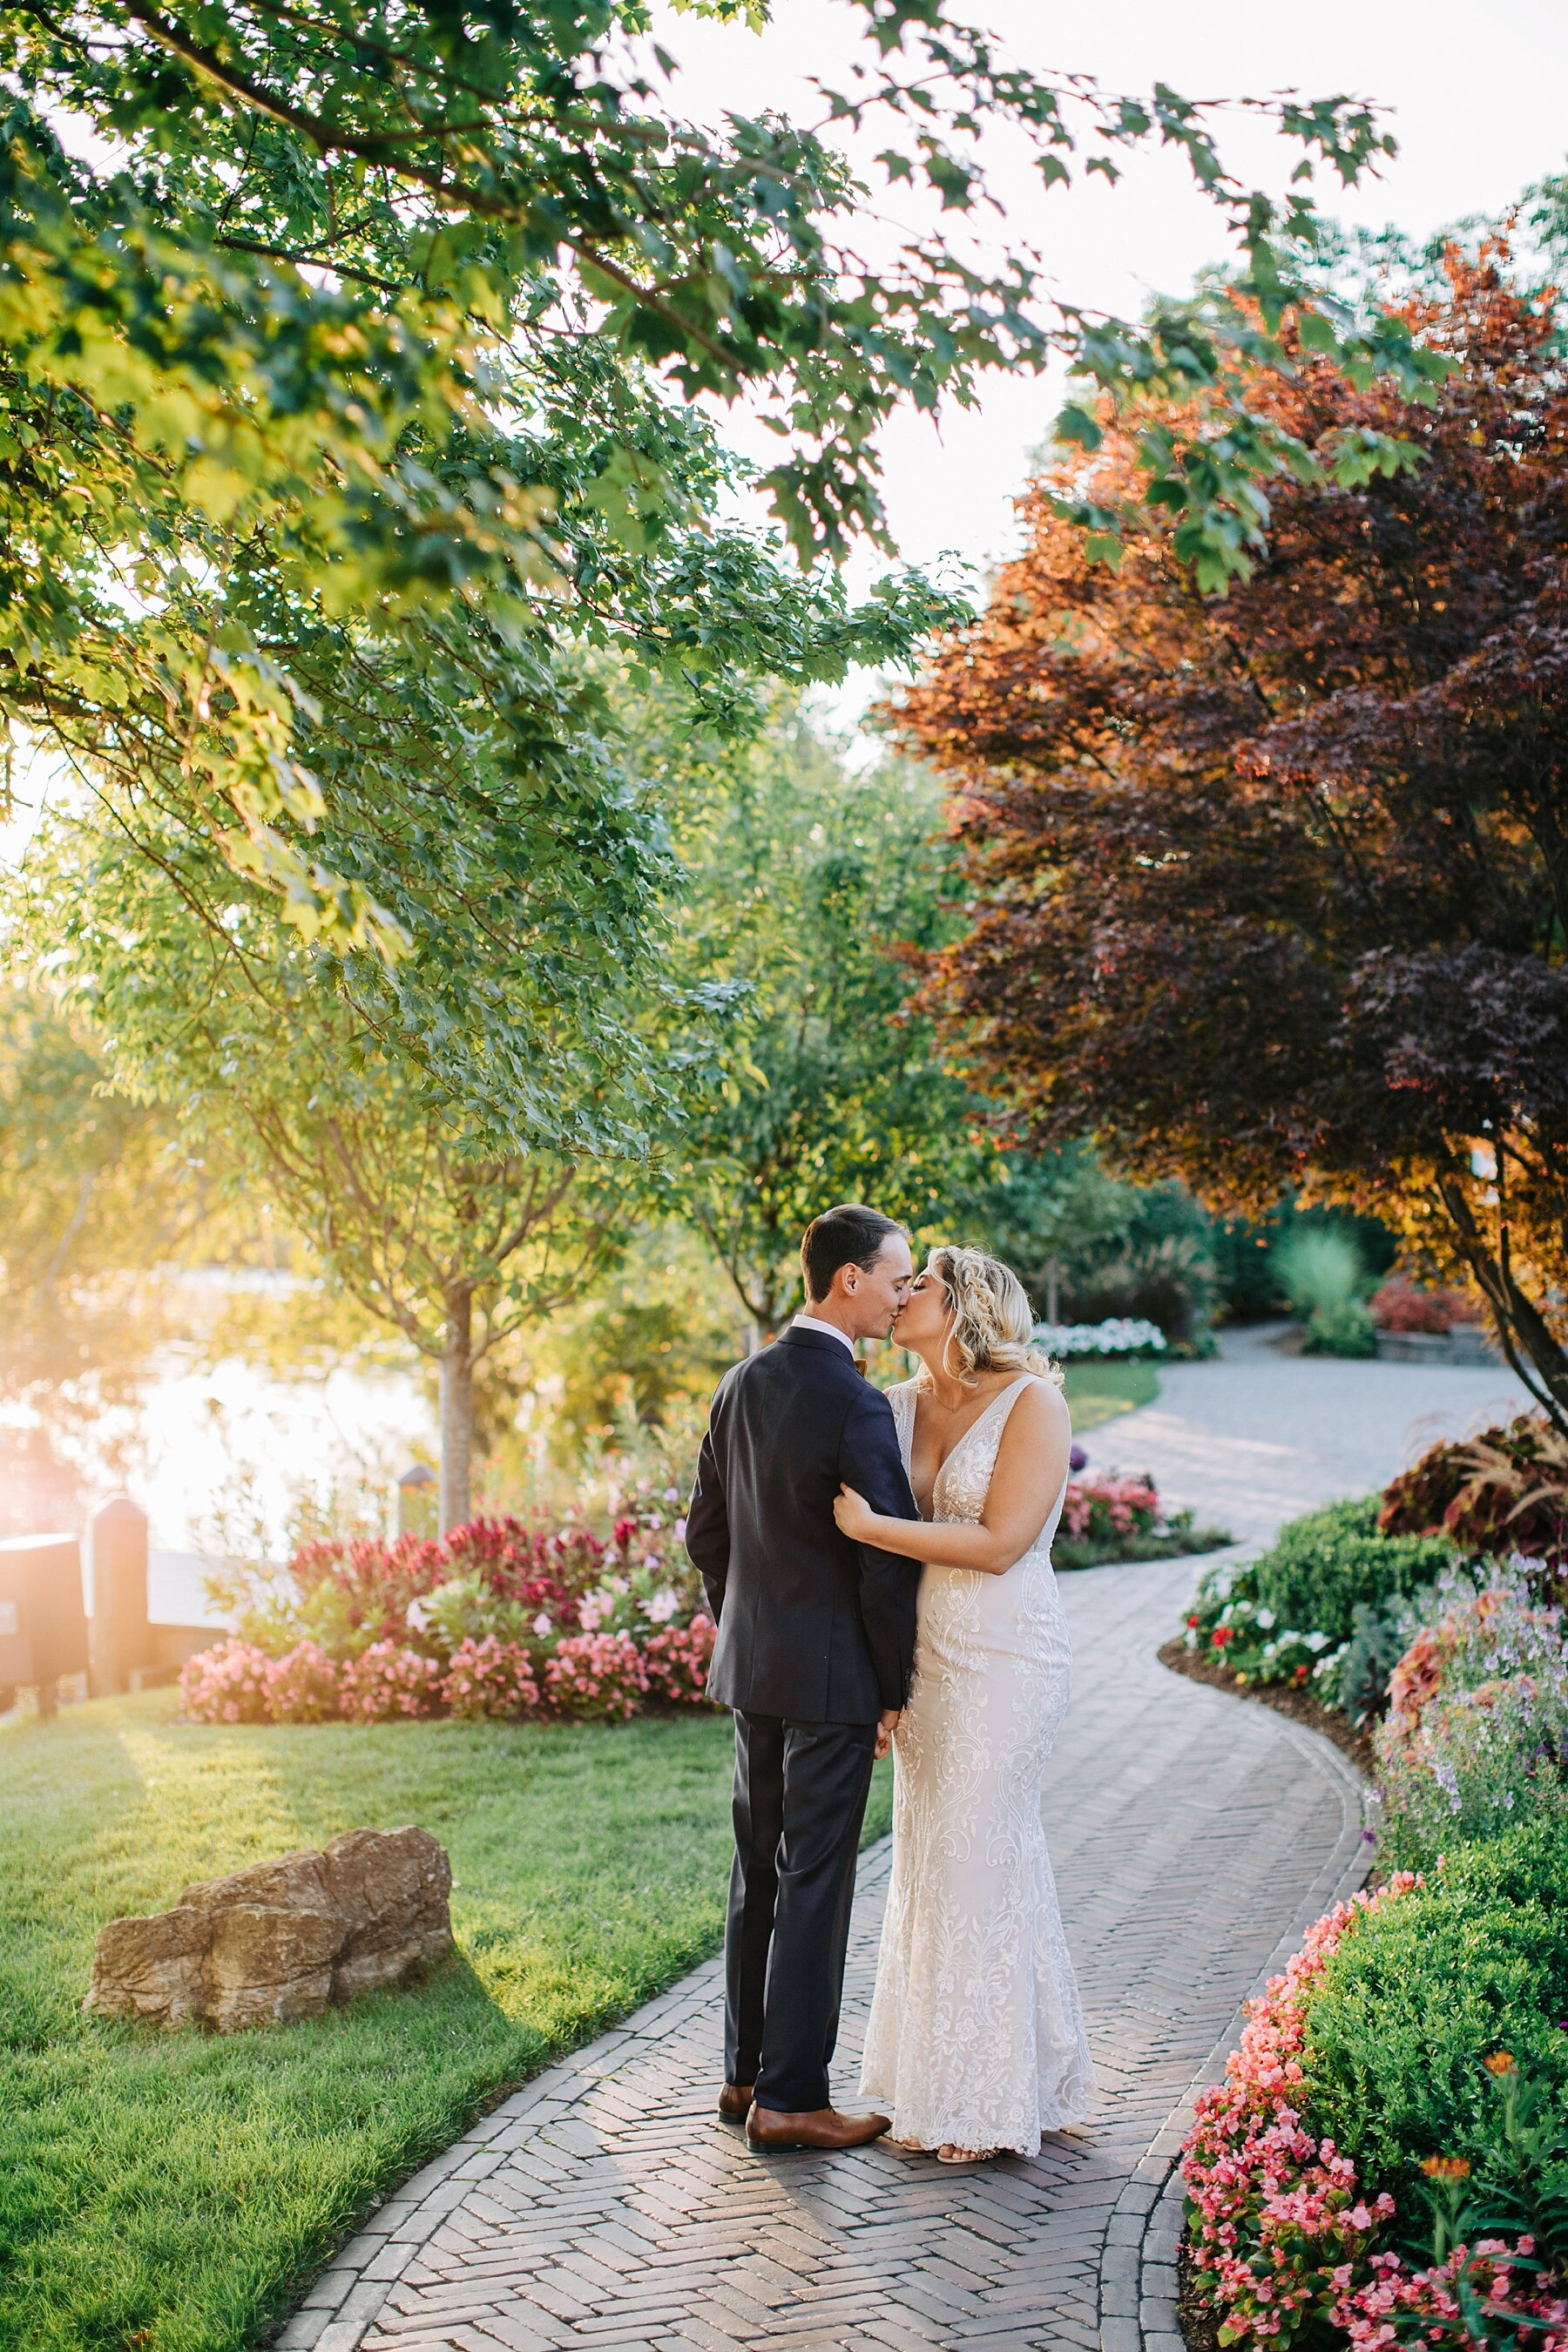 the-mill-lakeside-manor-spring-lake-wedding-photographer_0037.jpg